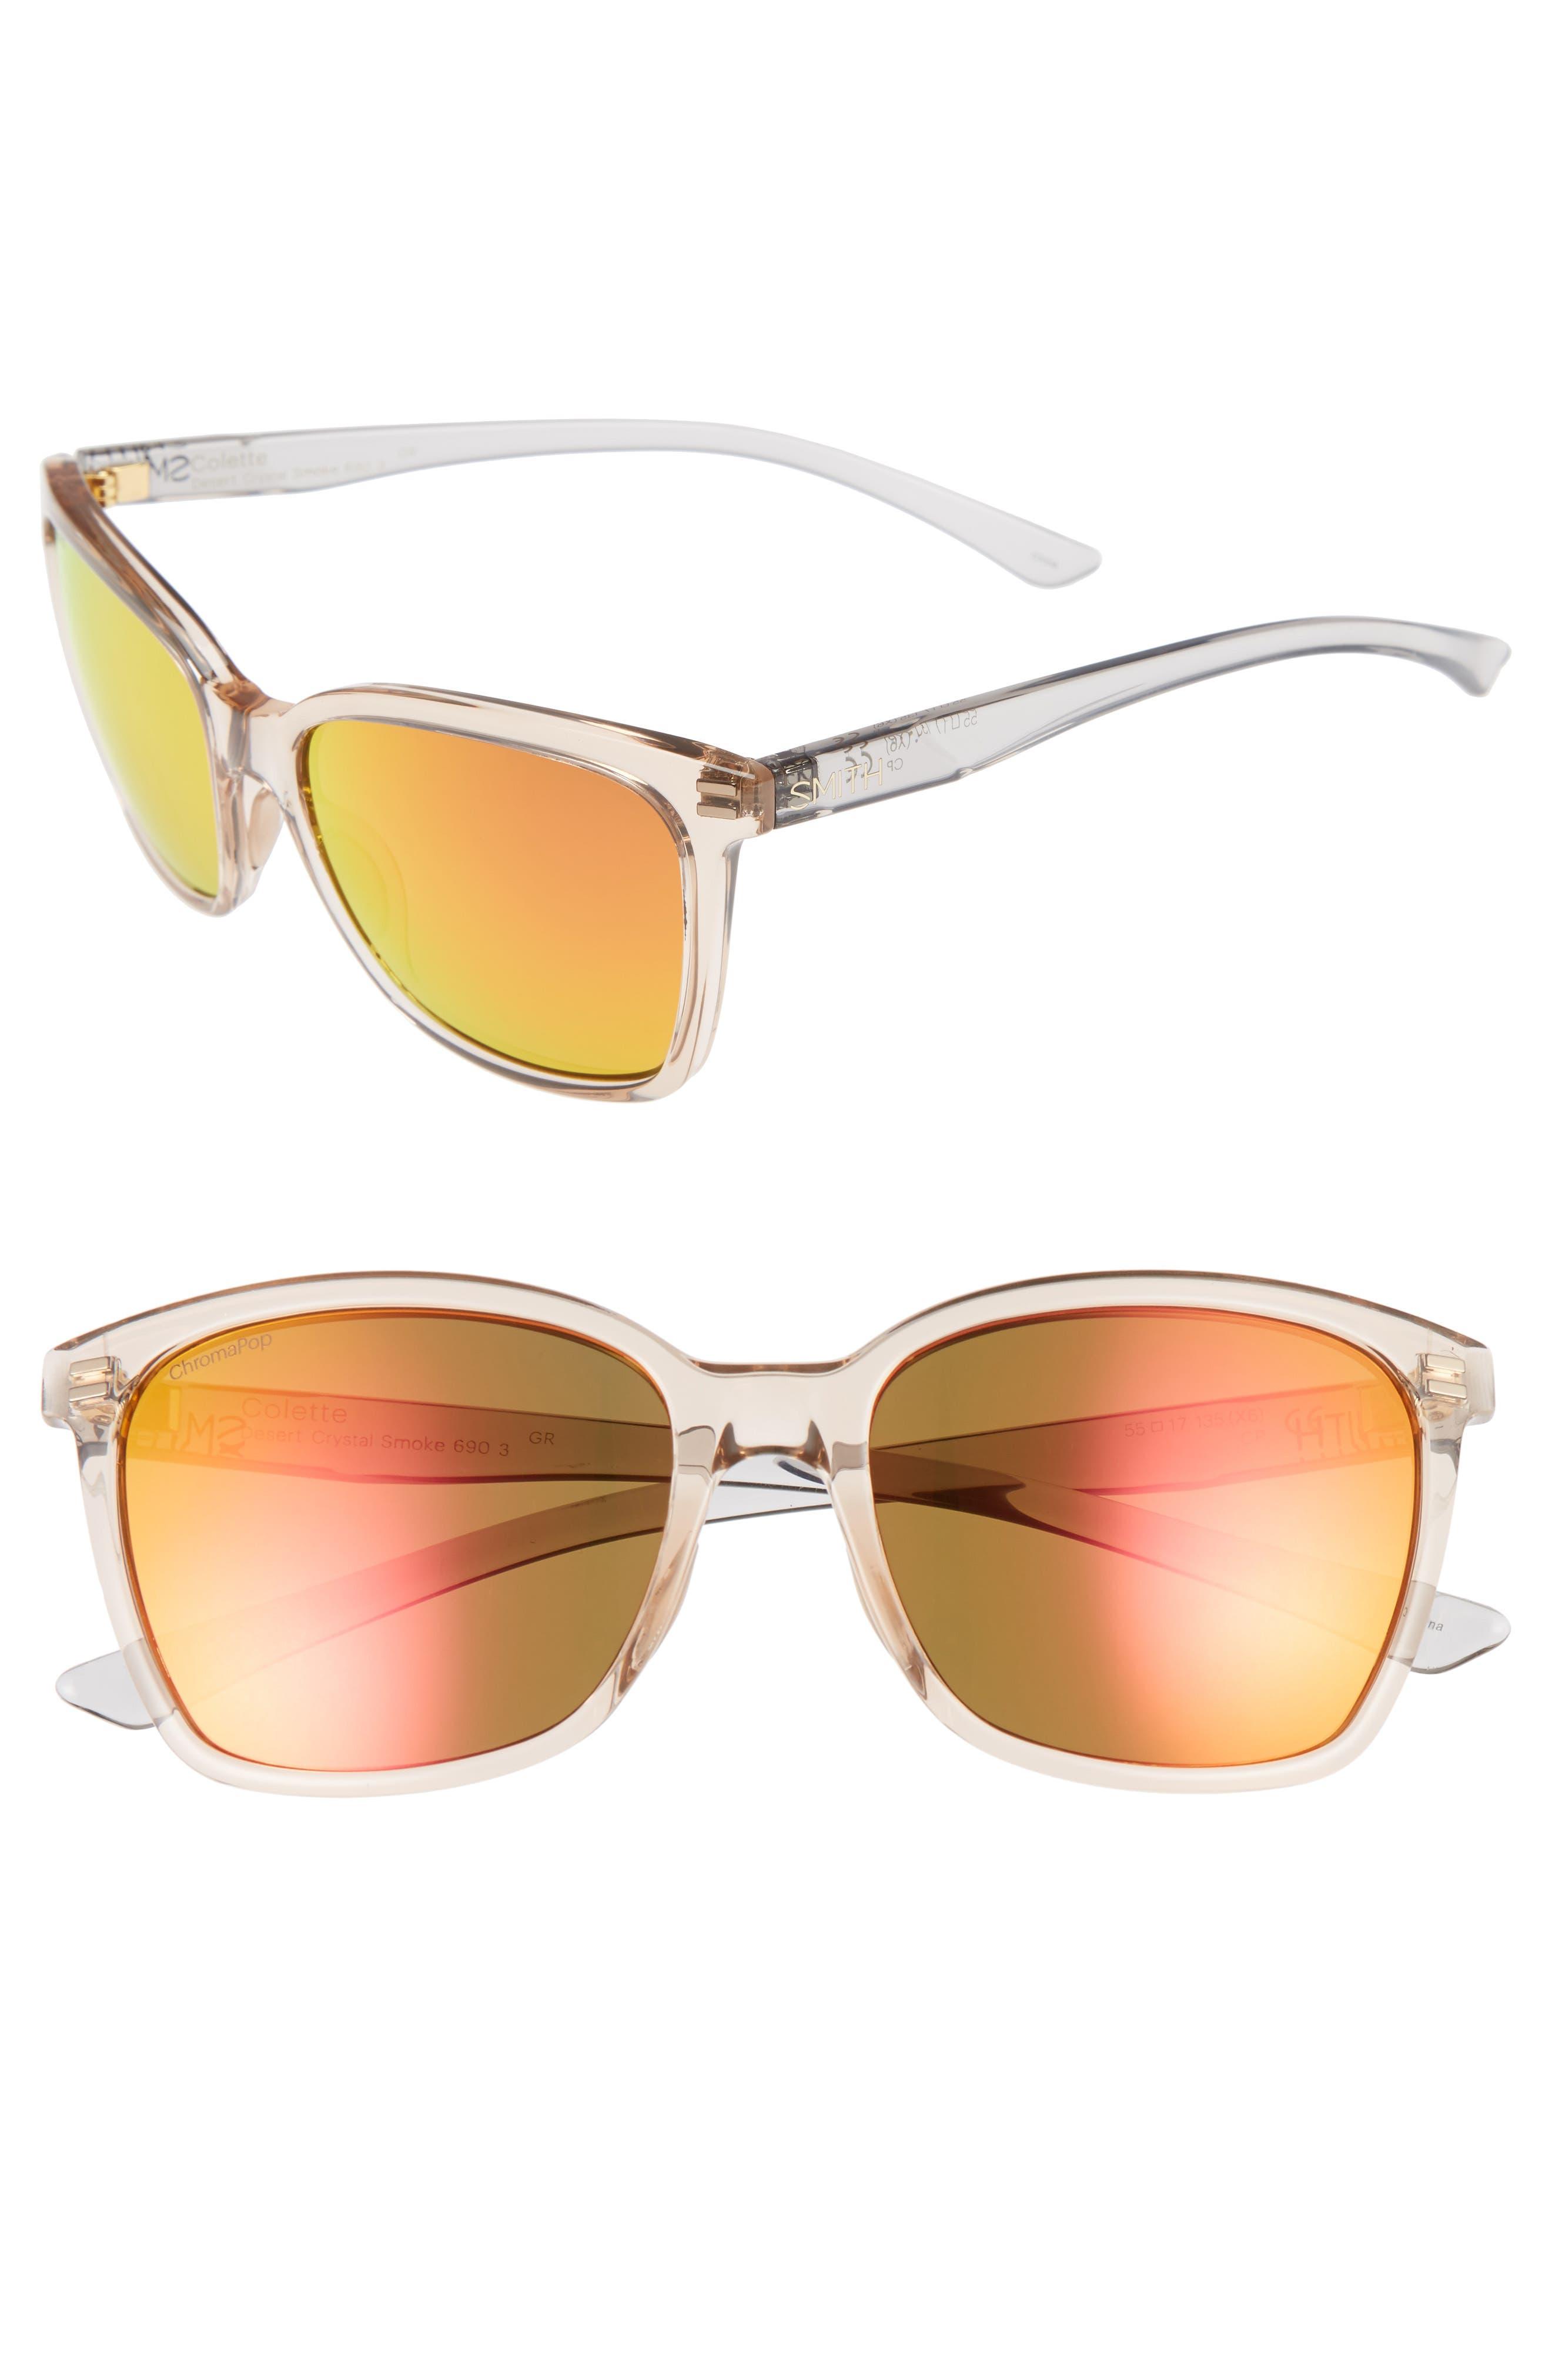 Main Image - Smith Colette Chromapop 55mm Polarized Mirrored Lens Sunglasses